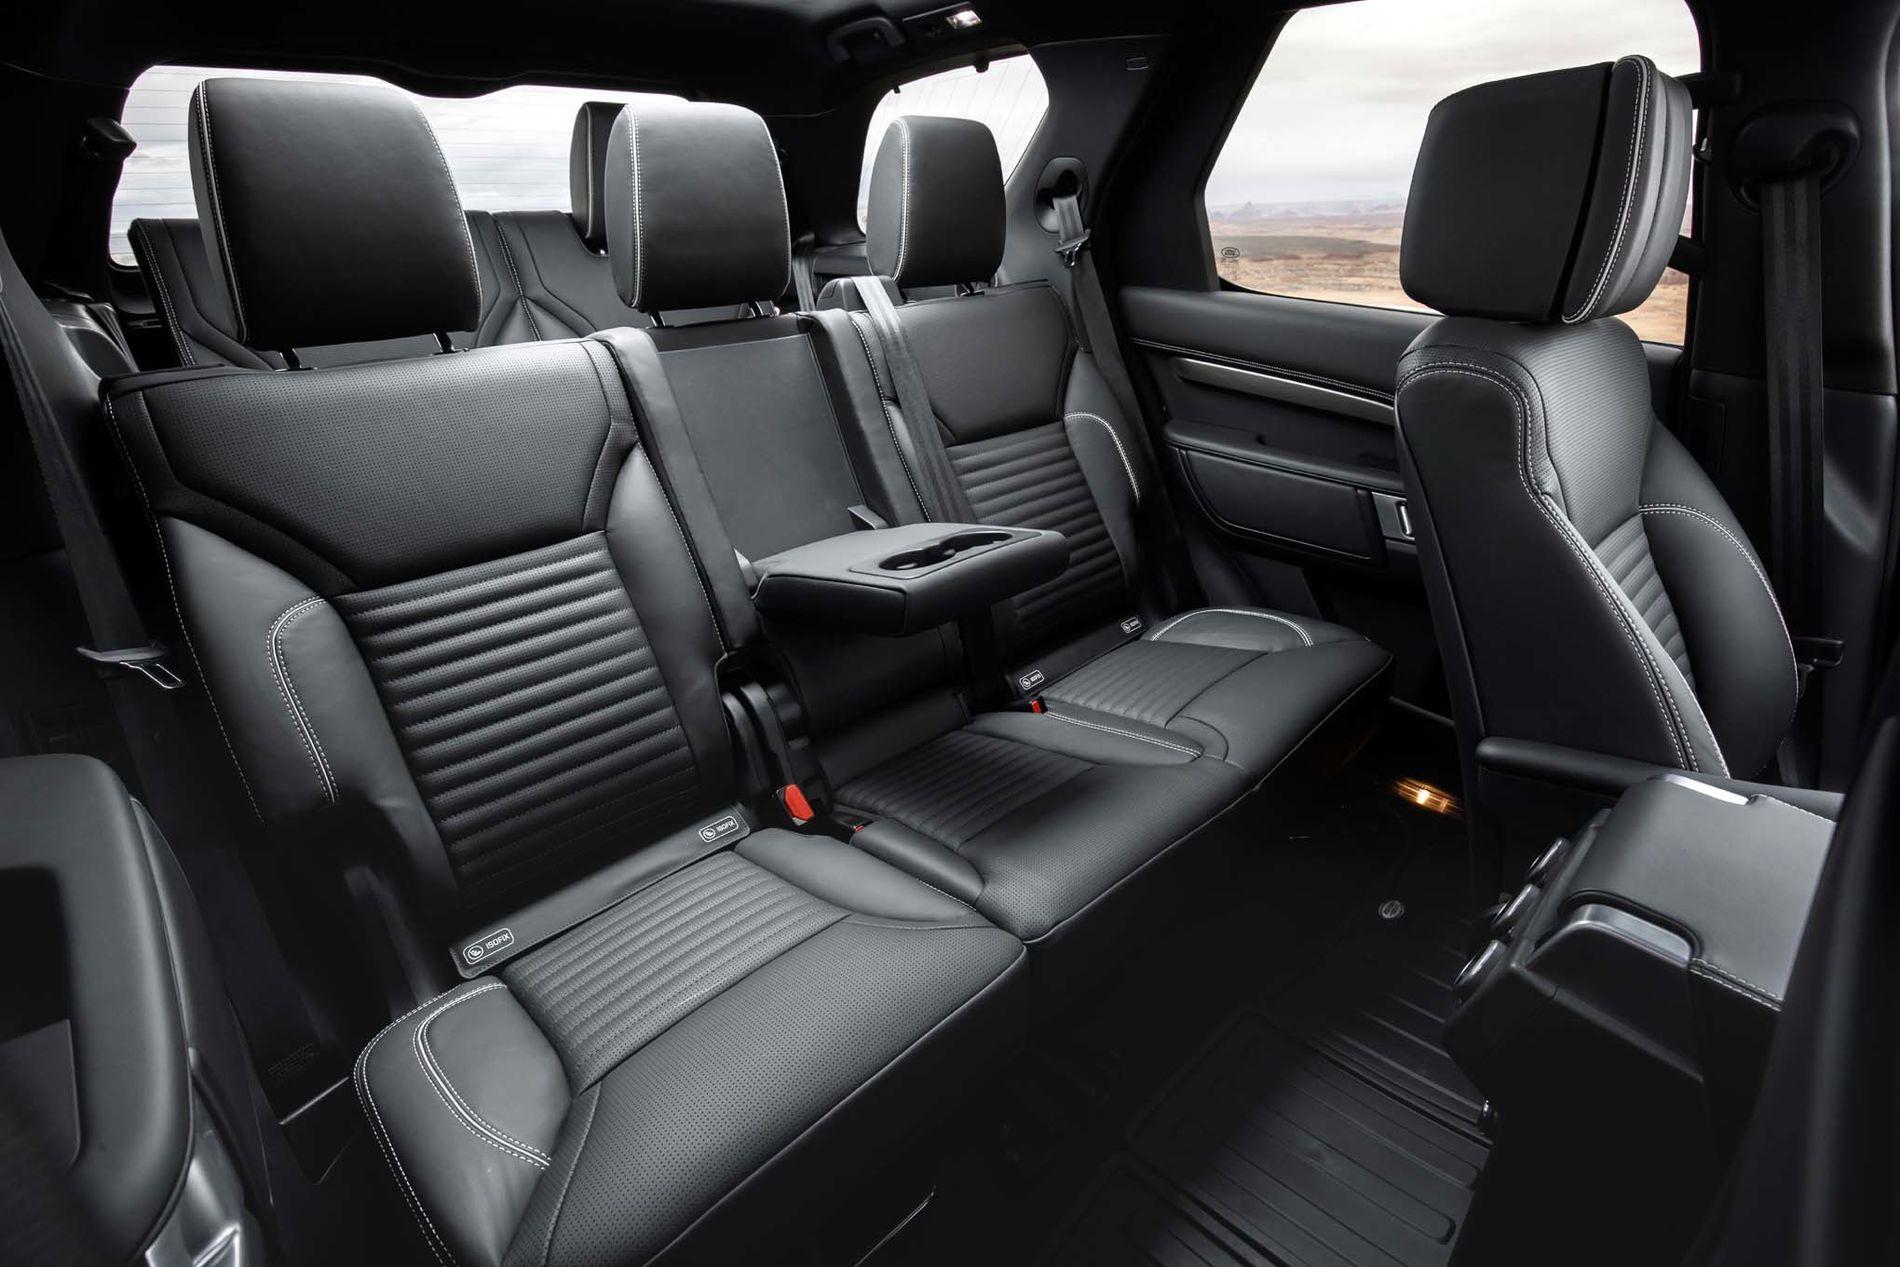 2018-Land-Rover-Discovery-Rear-Seat-Photos.jpg